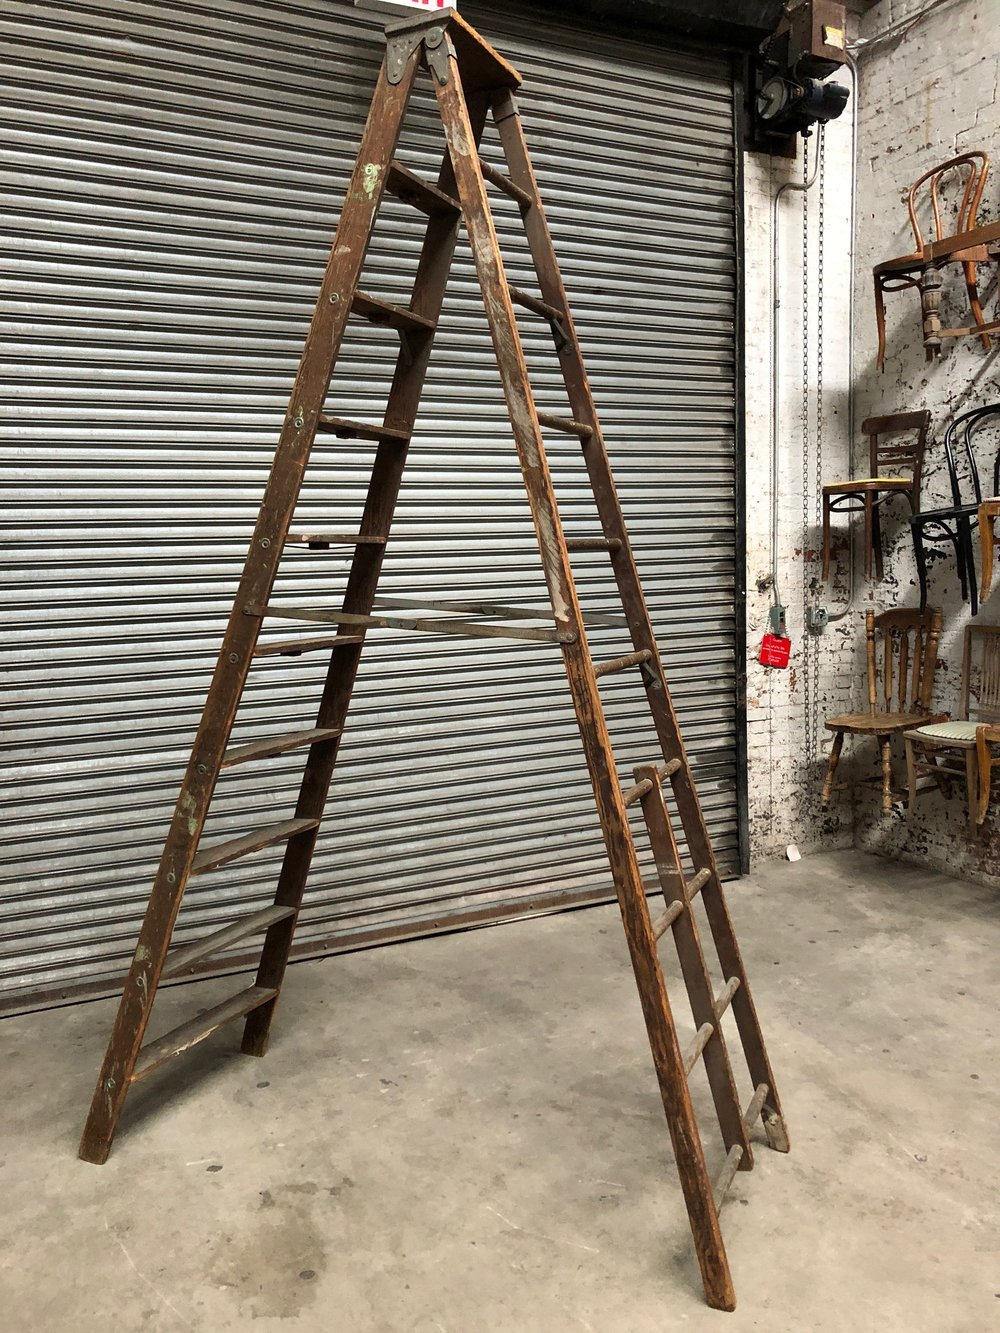 9-Step Wooden Ladder $80